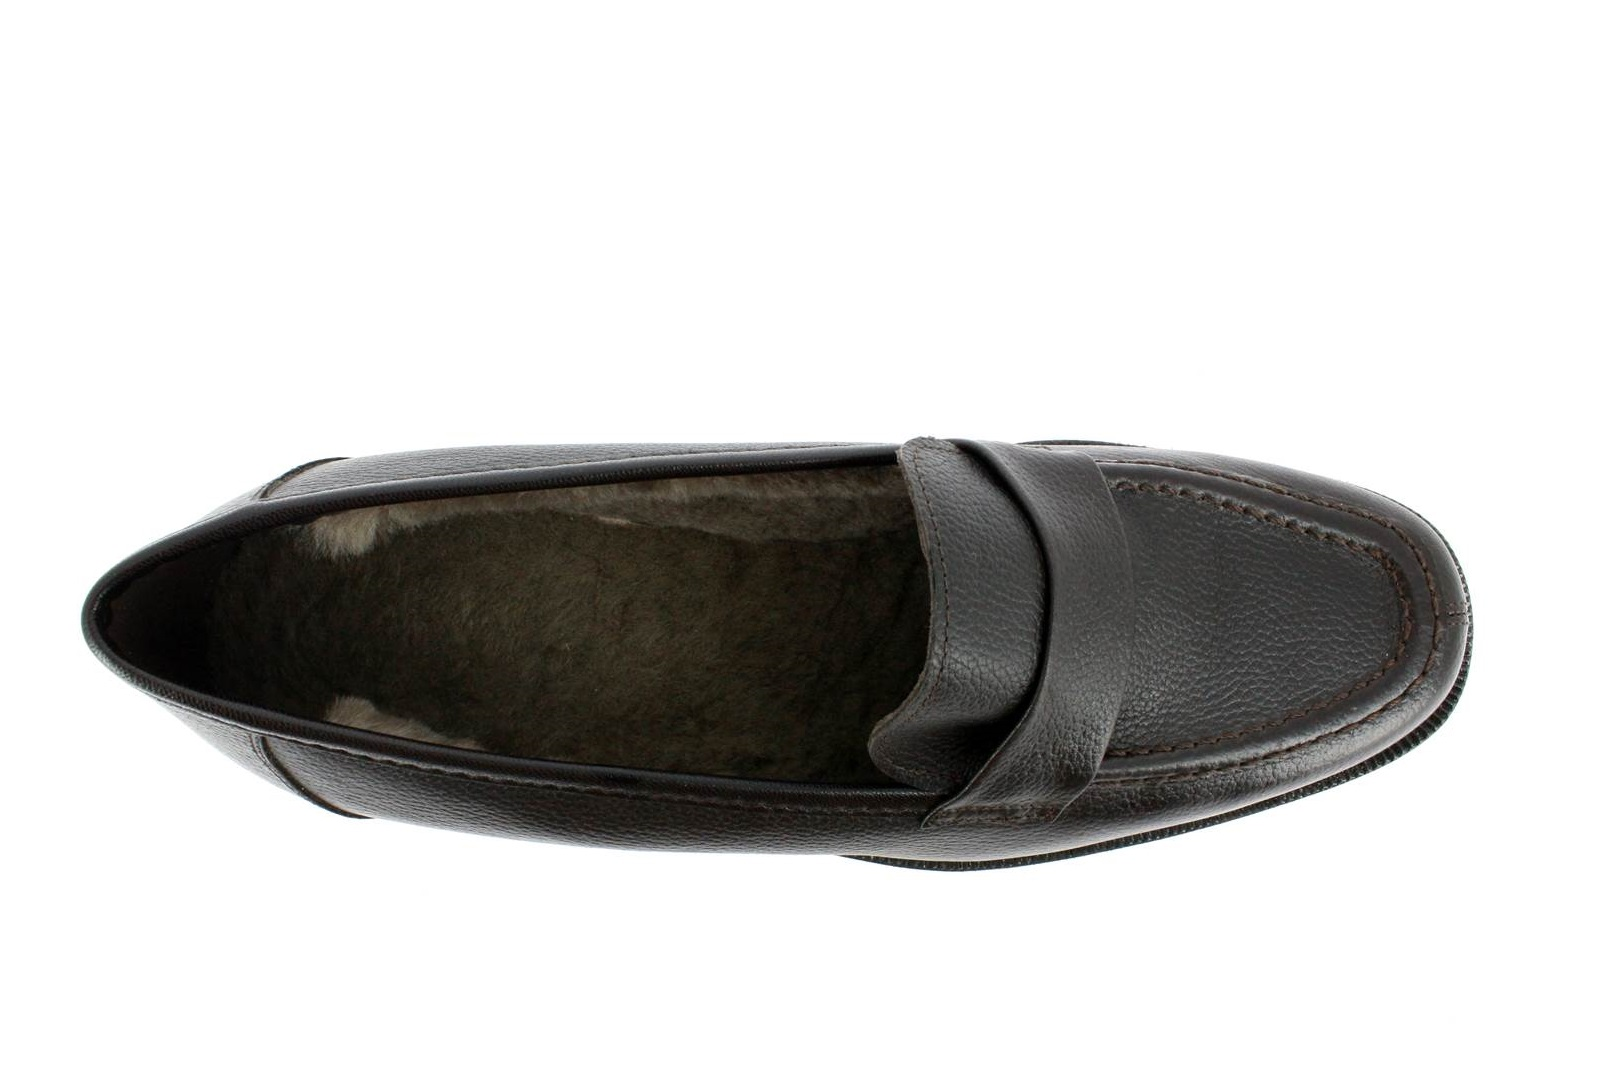 Brunate Loafer DANY OXDRY MORO TEX